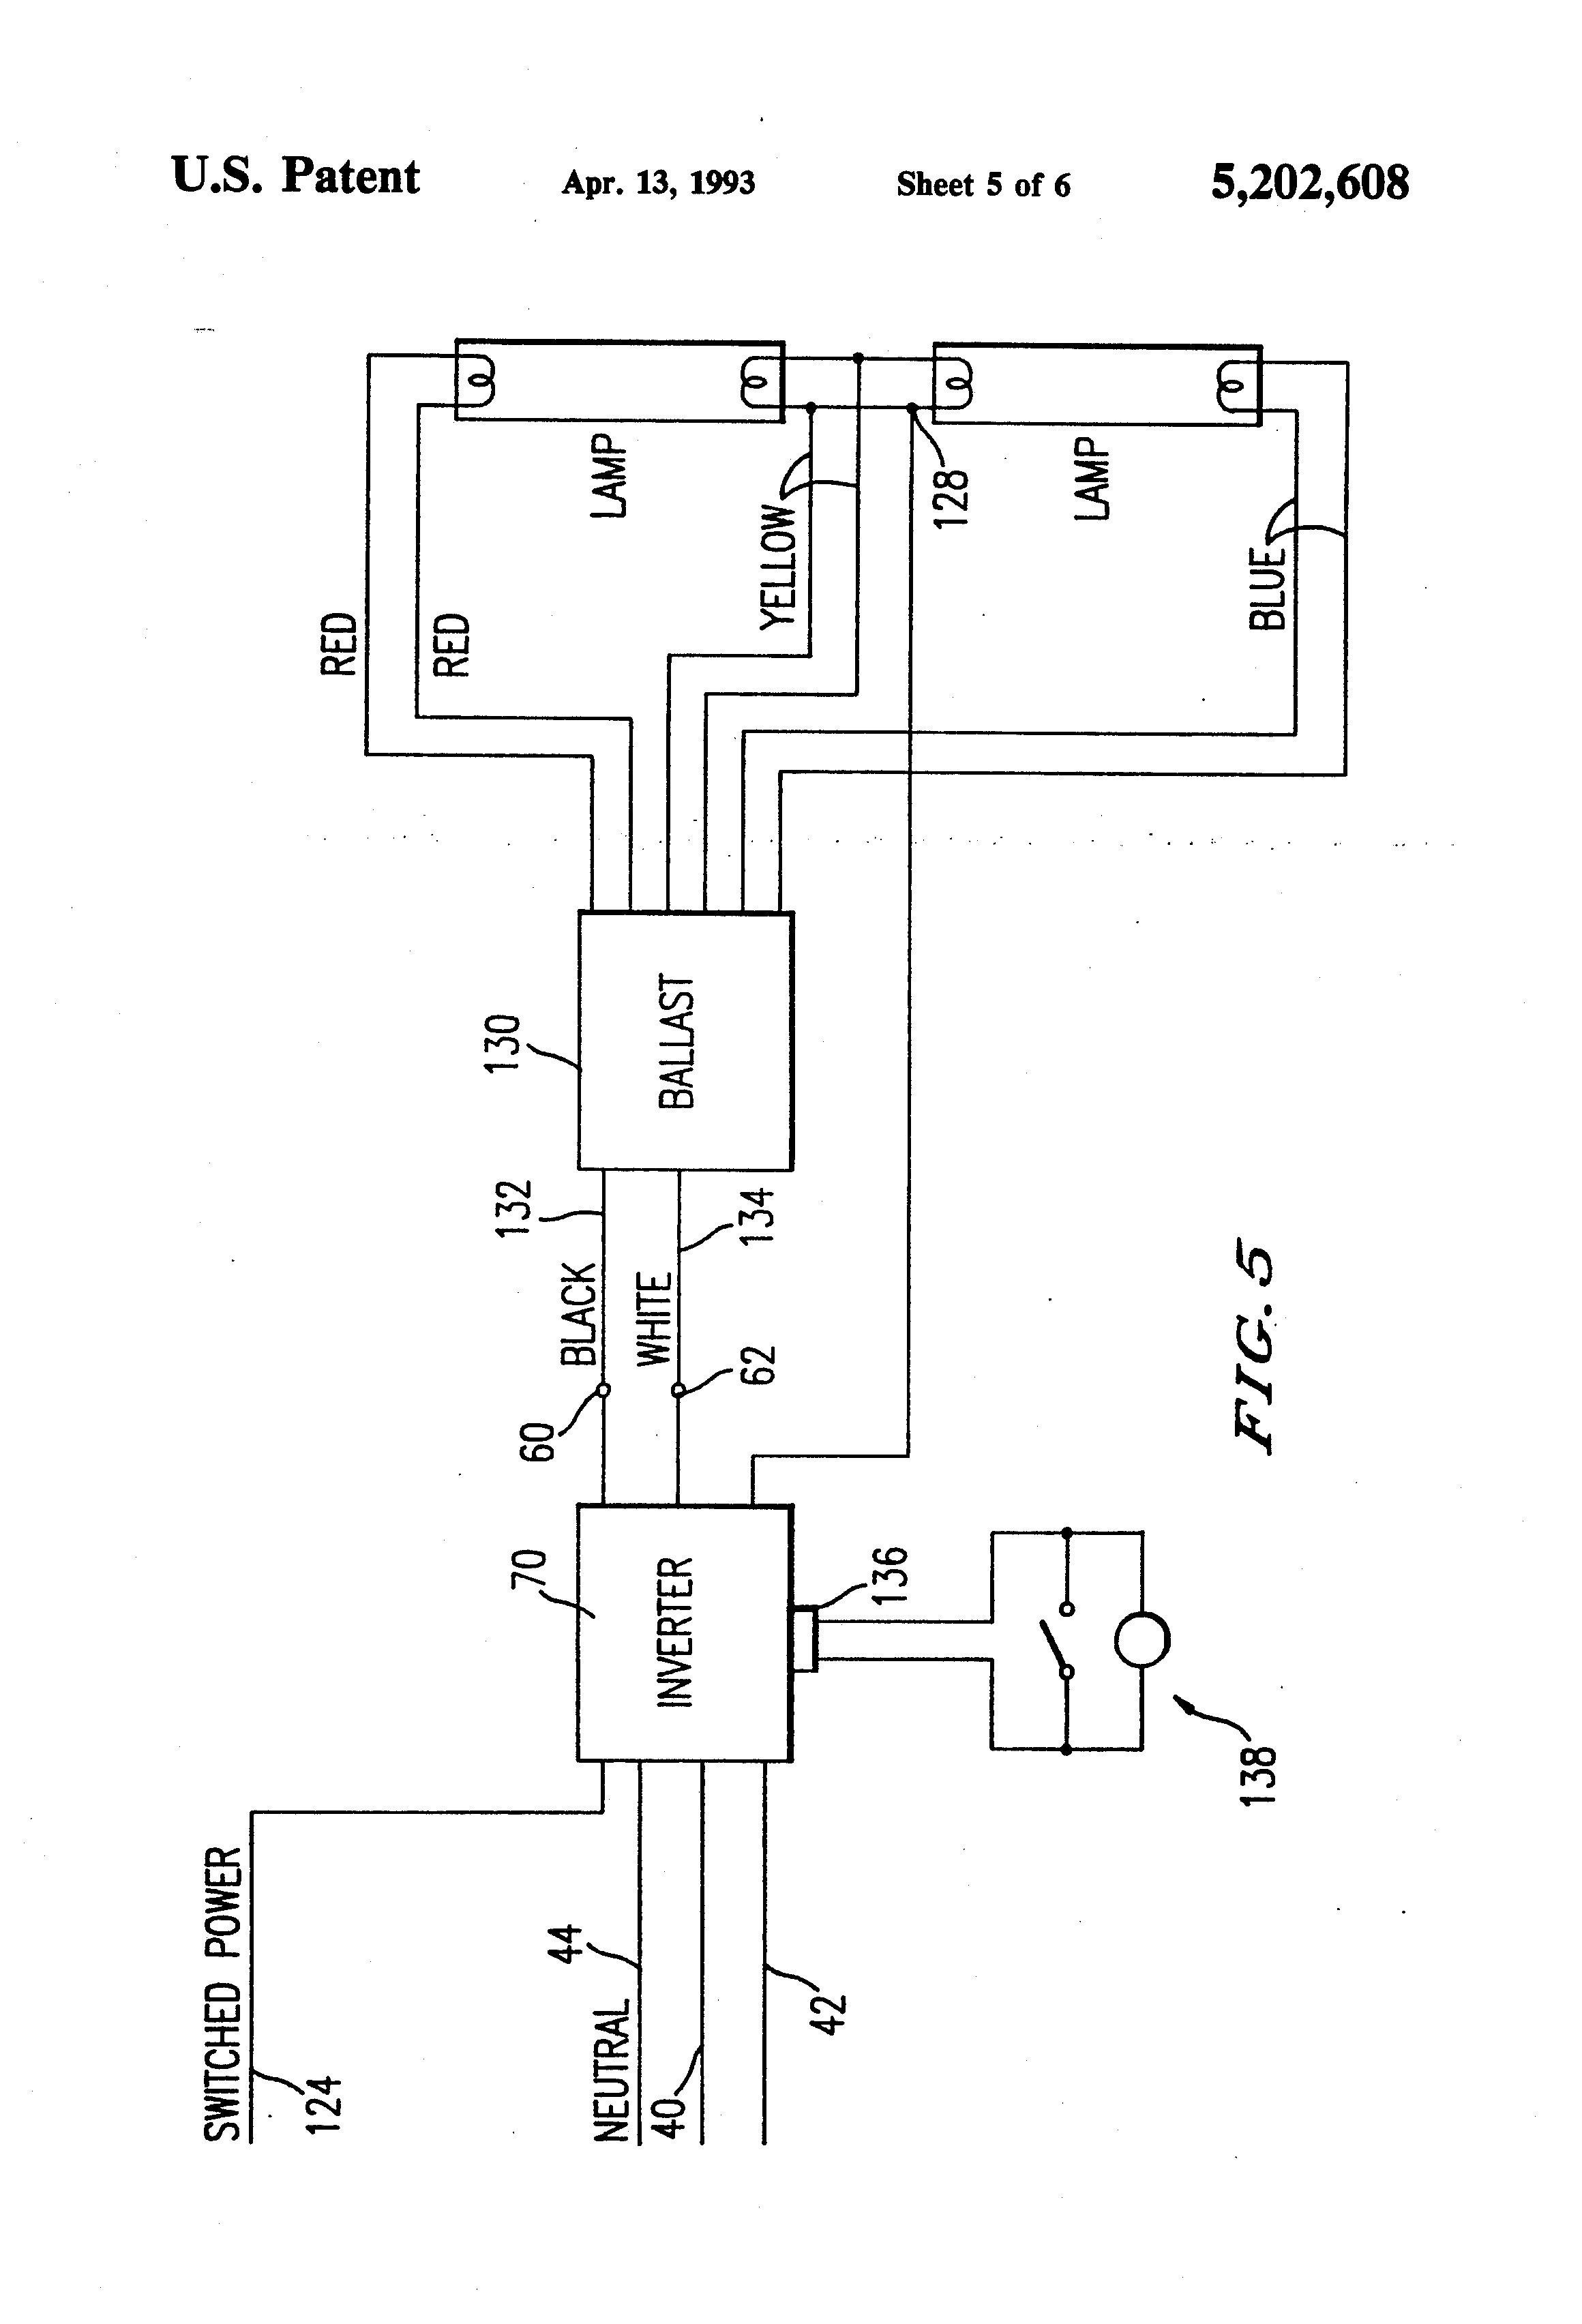 277 Volt Wiring Colors   Wiring Diagram - 277 Volt Lighting Wiring Diagram